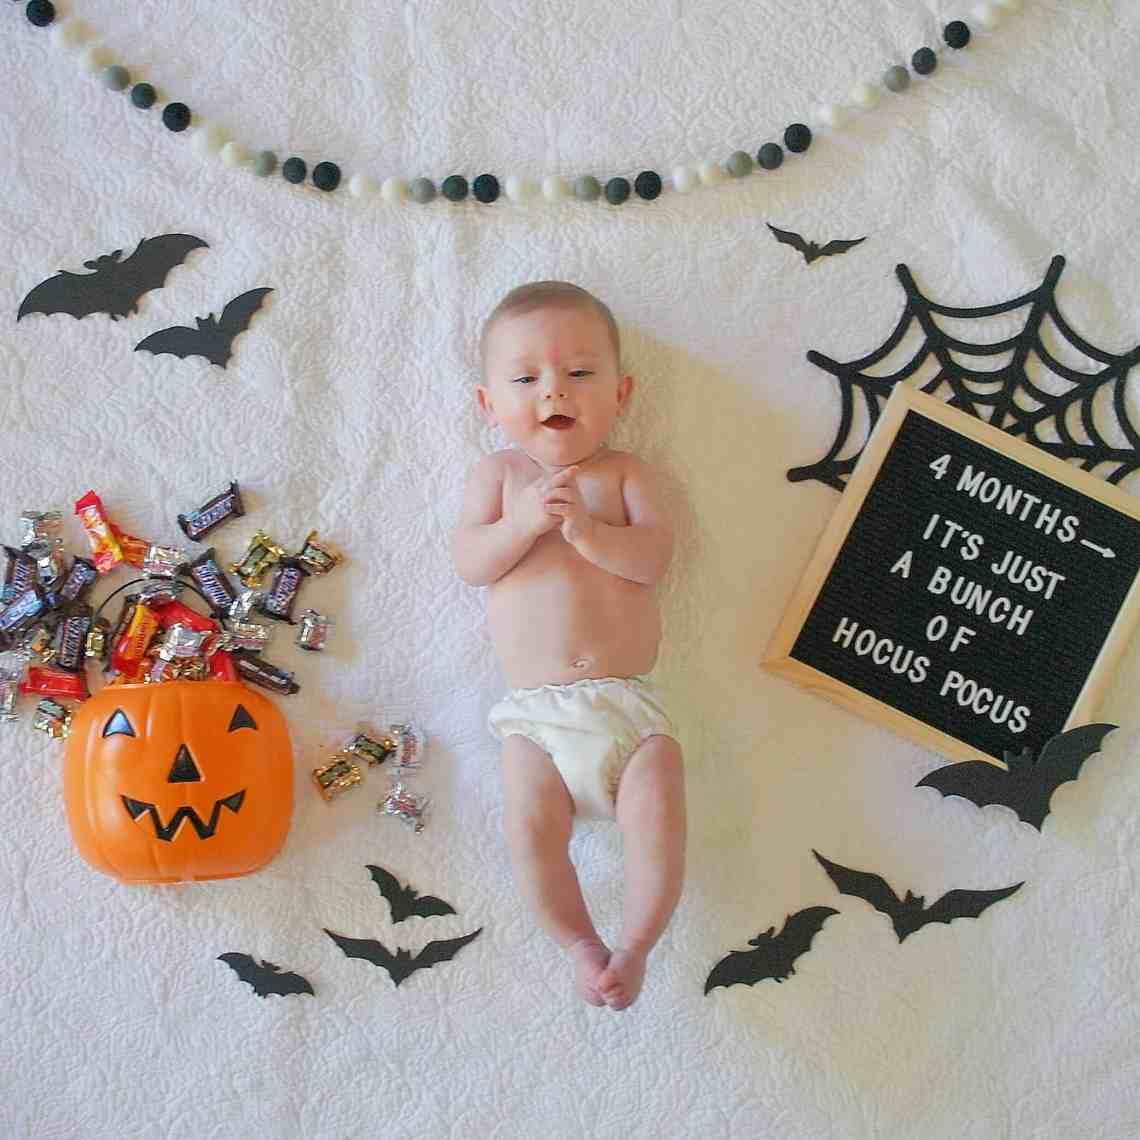 October 17 updates - www.arinsolangeathome.com